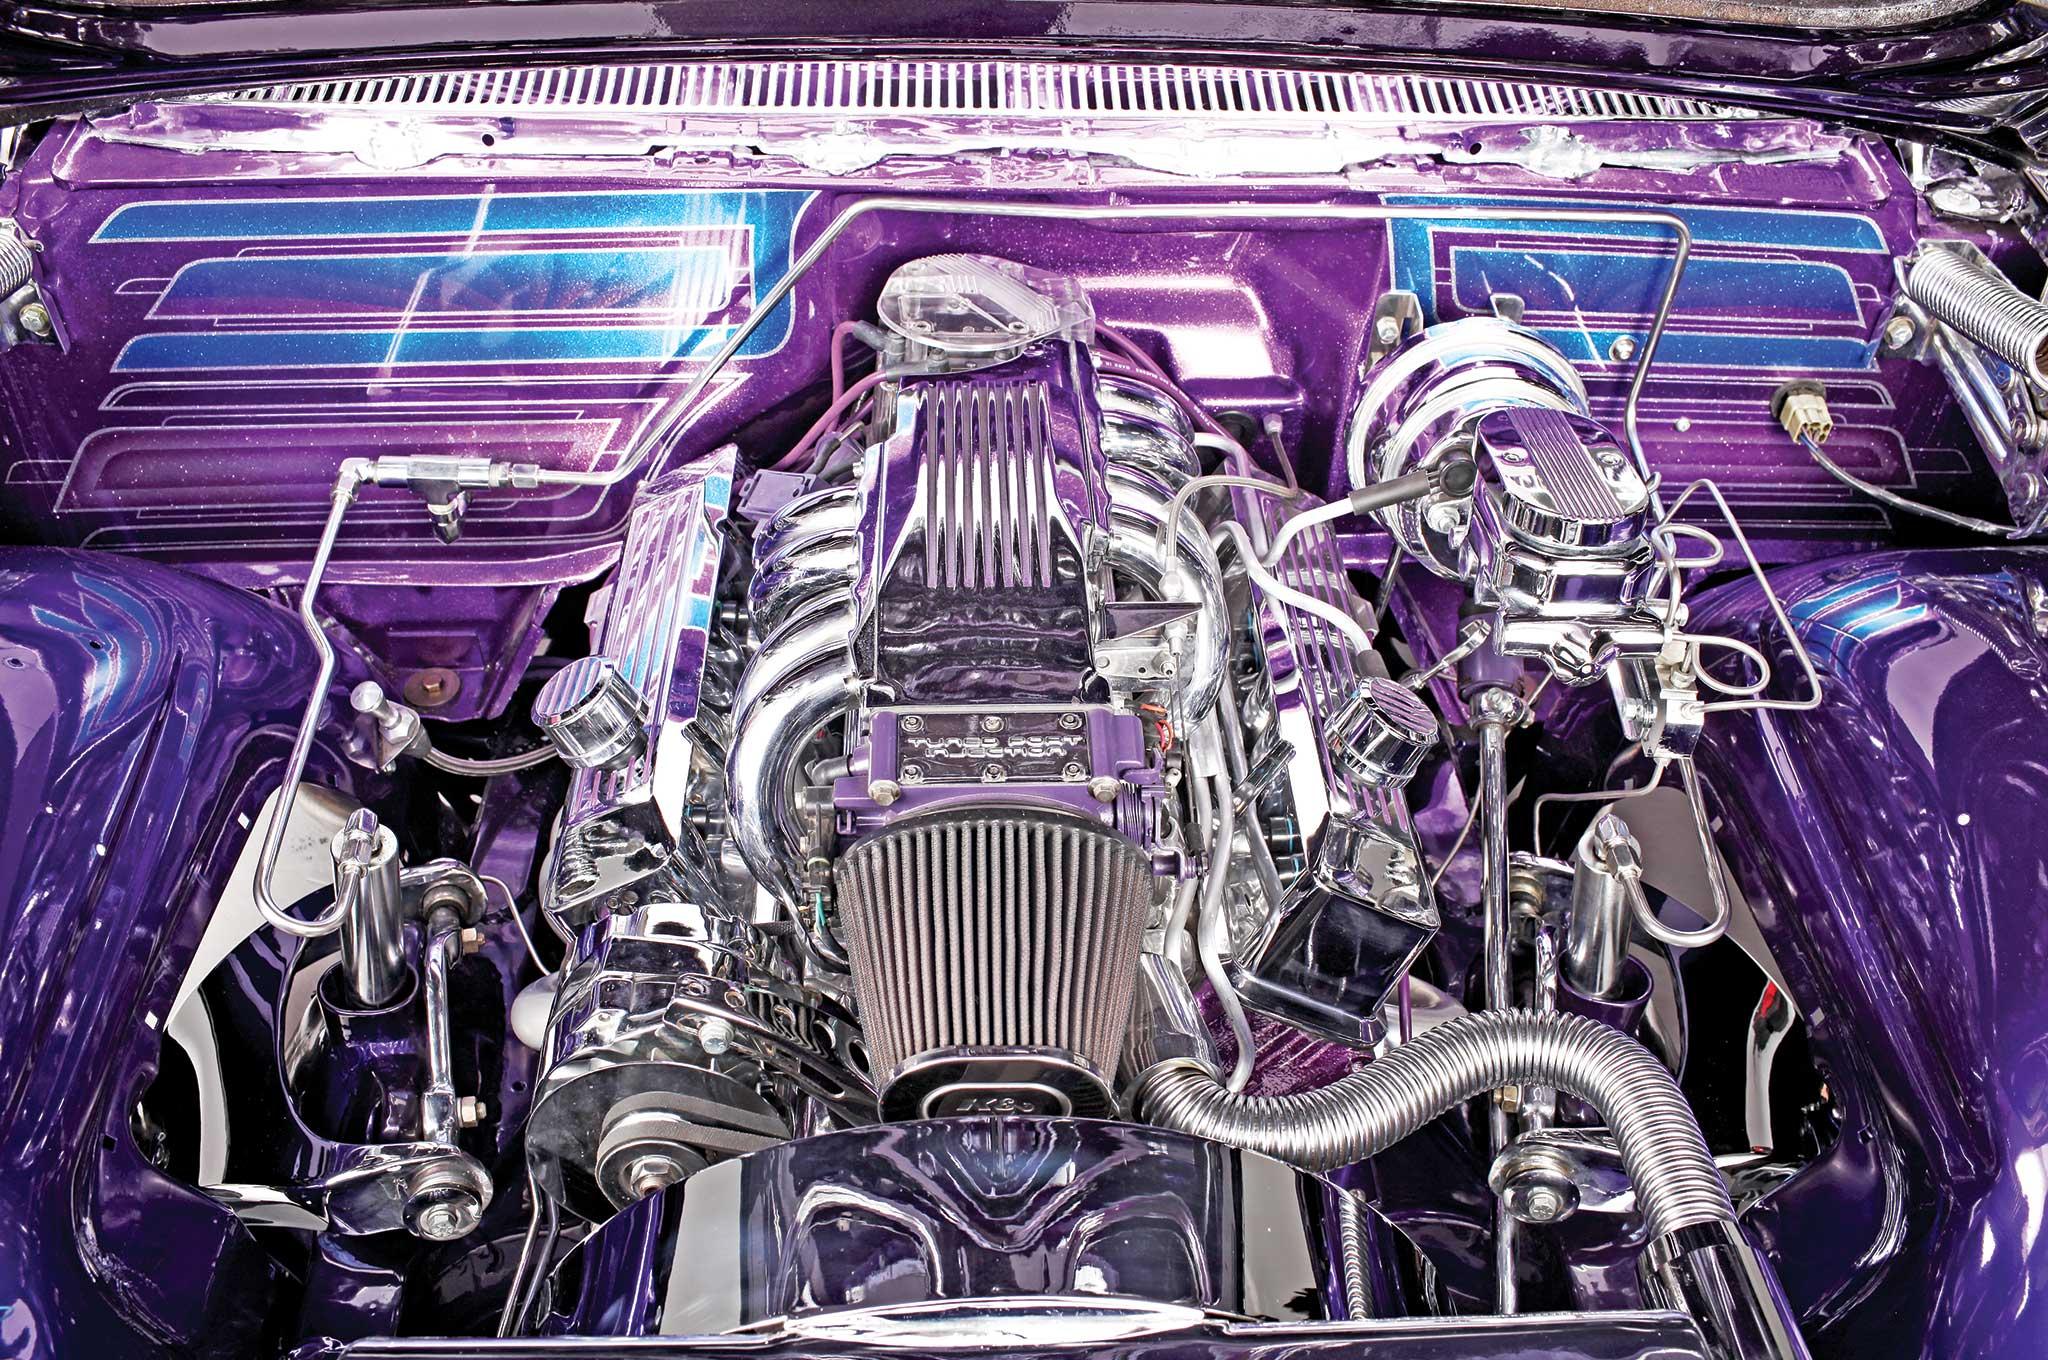 009 1959 chevrolet impala convertible 350 v8